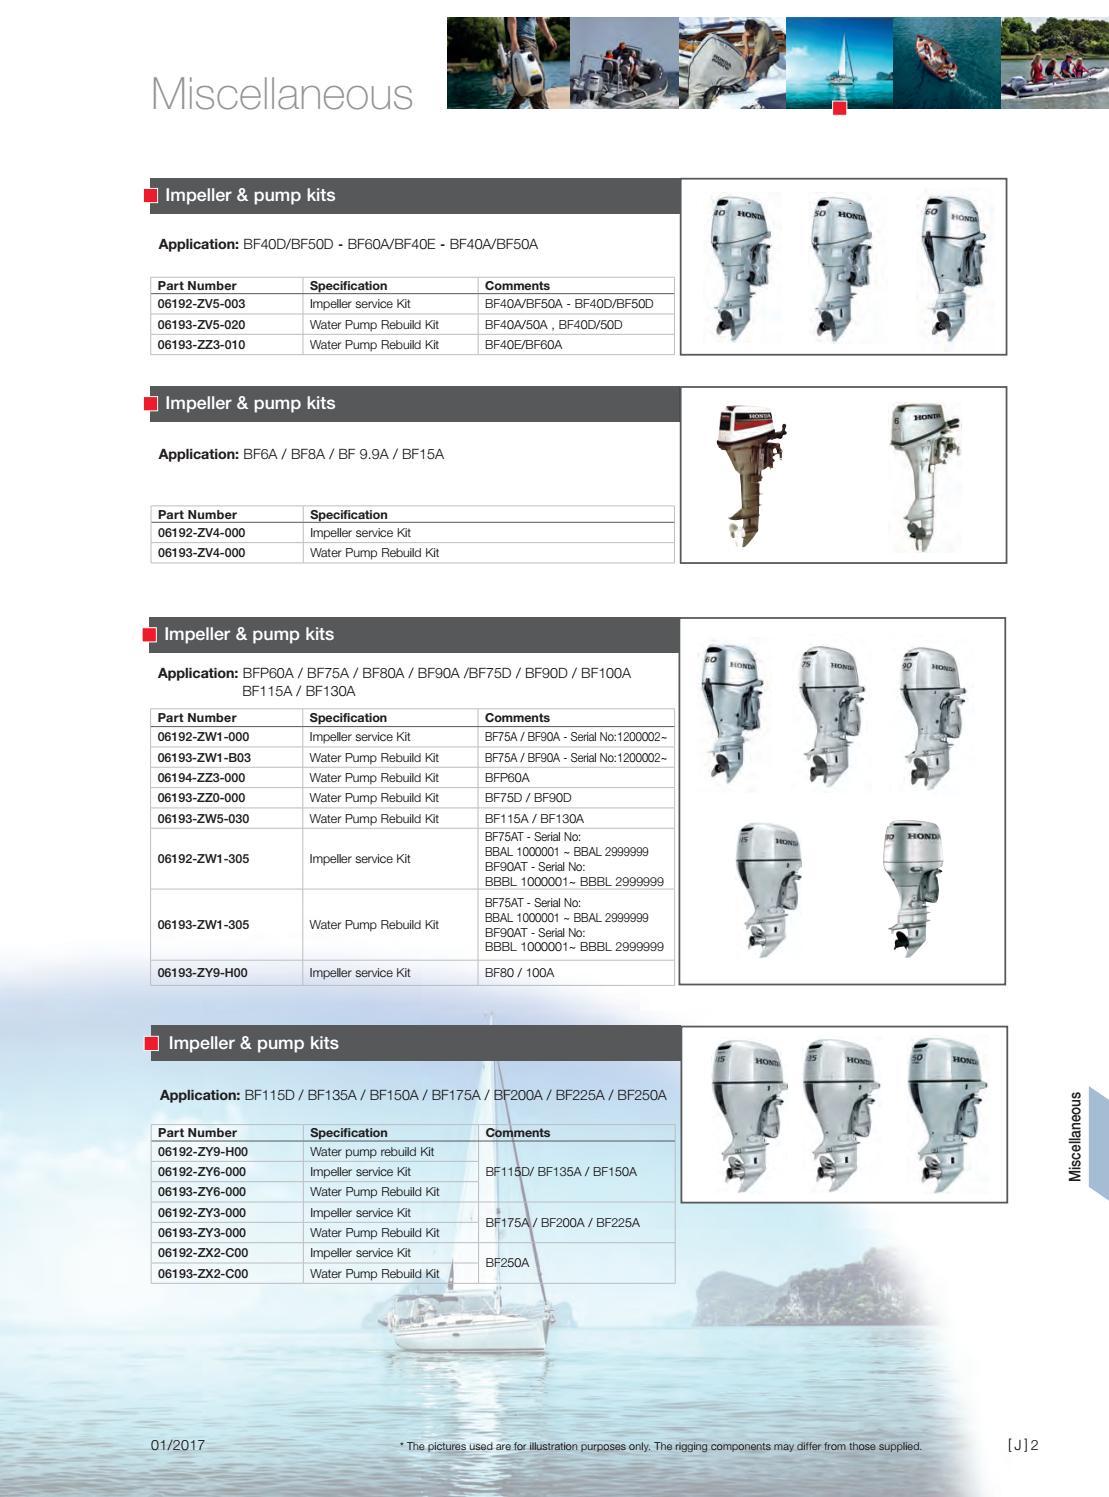 Honda 06193-ZY6-000 Pump Kit Impeller